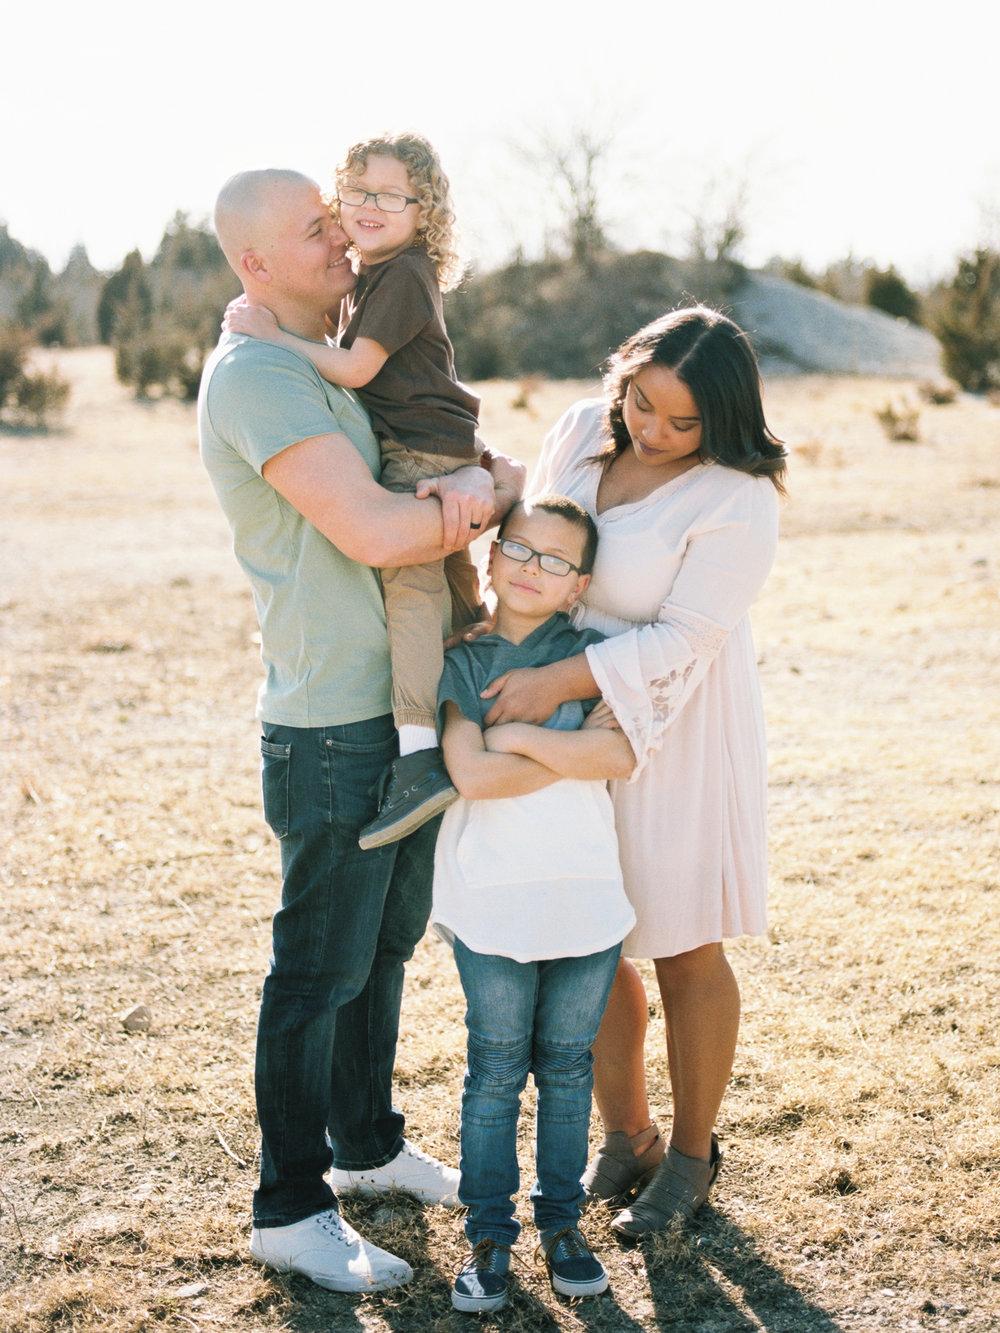 Myers_Film_Family_Portraits_Dayton_Cincinnati_Ohio_Photographer-36.jpg